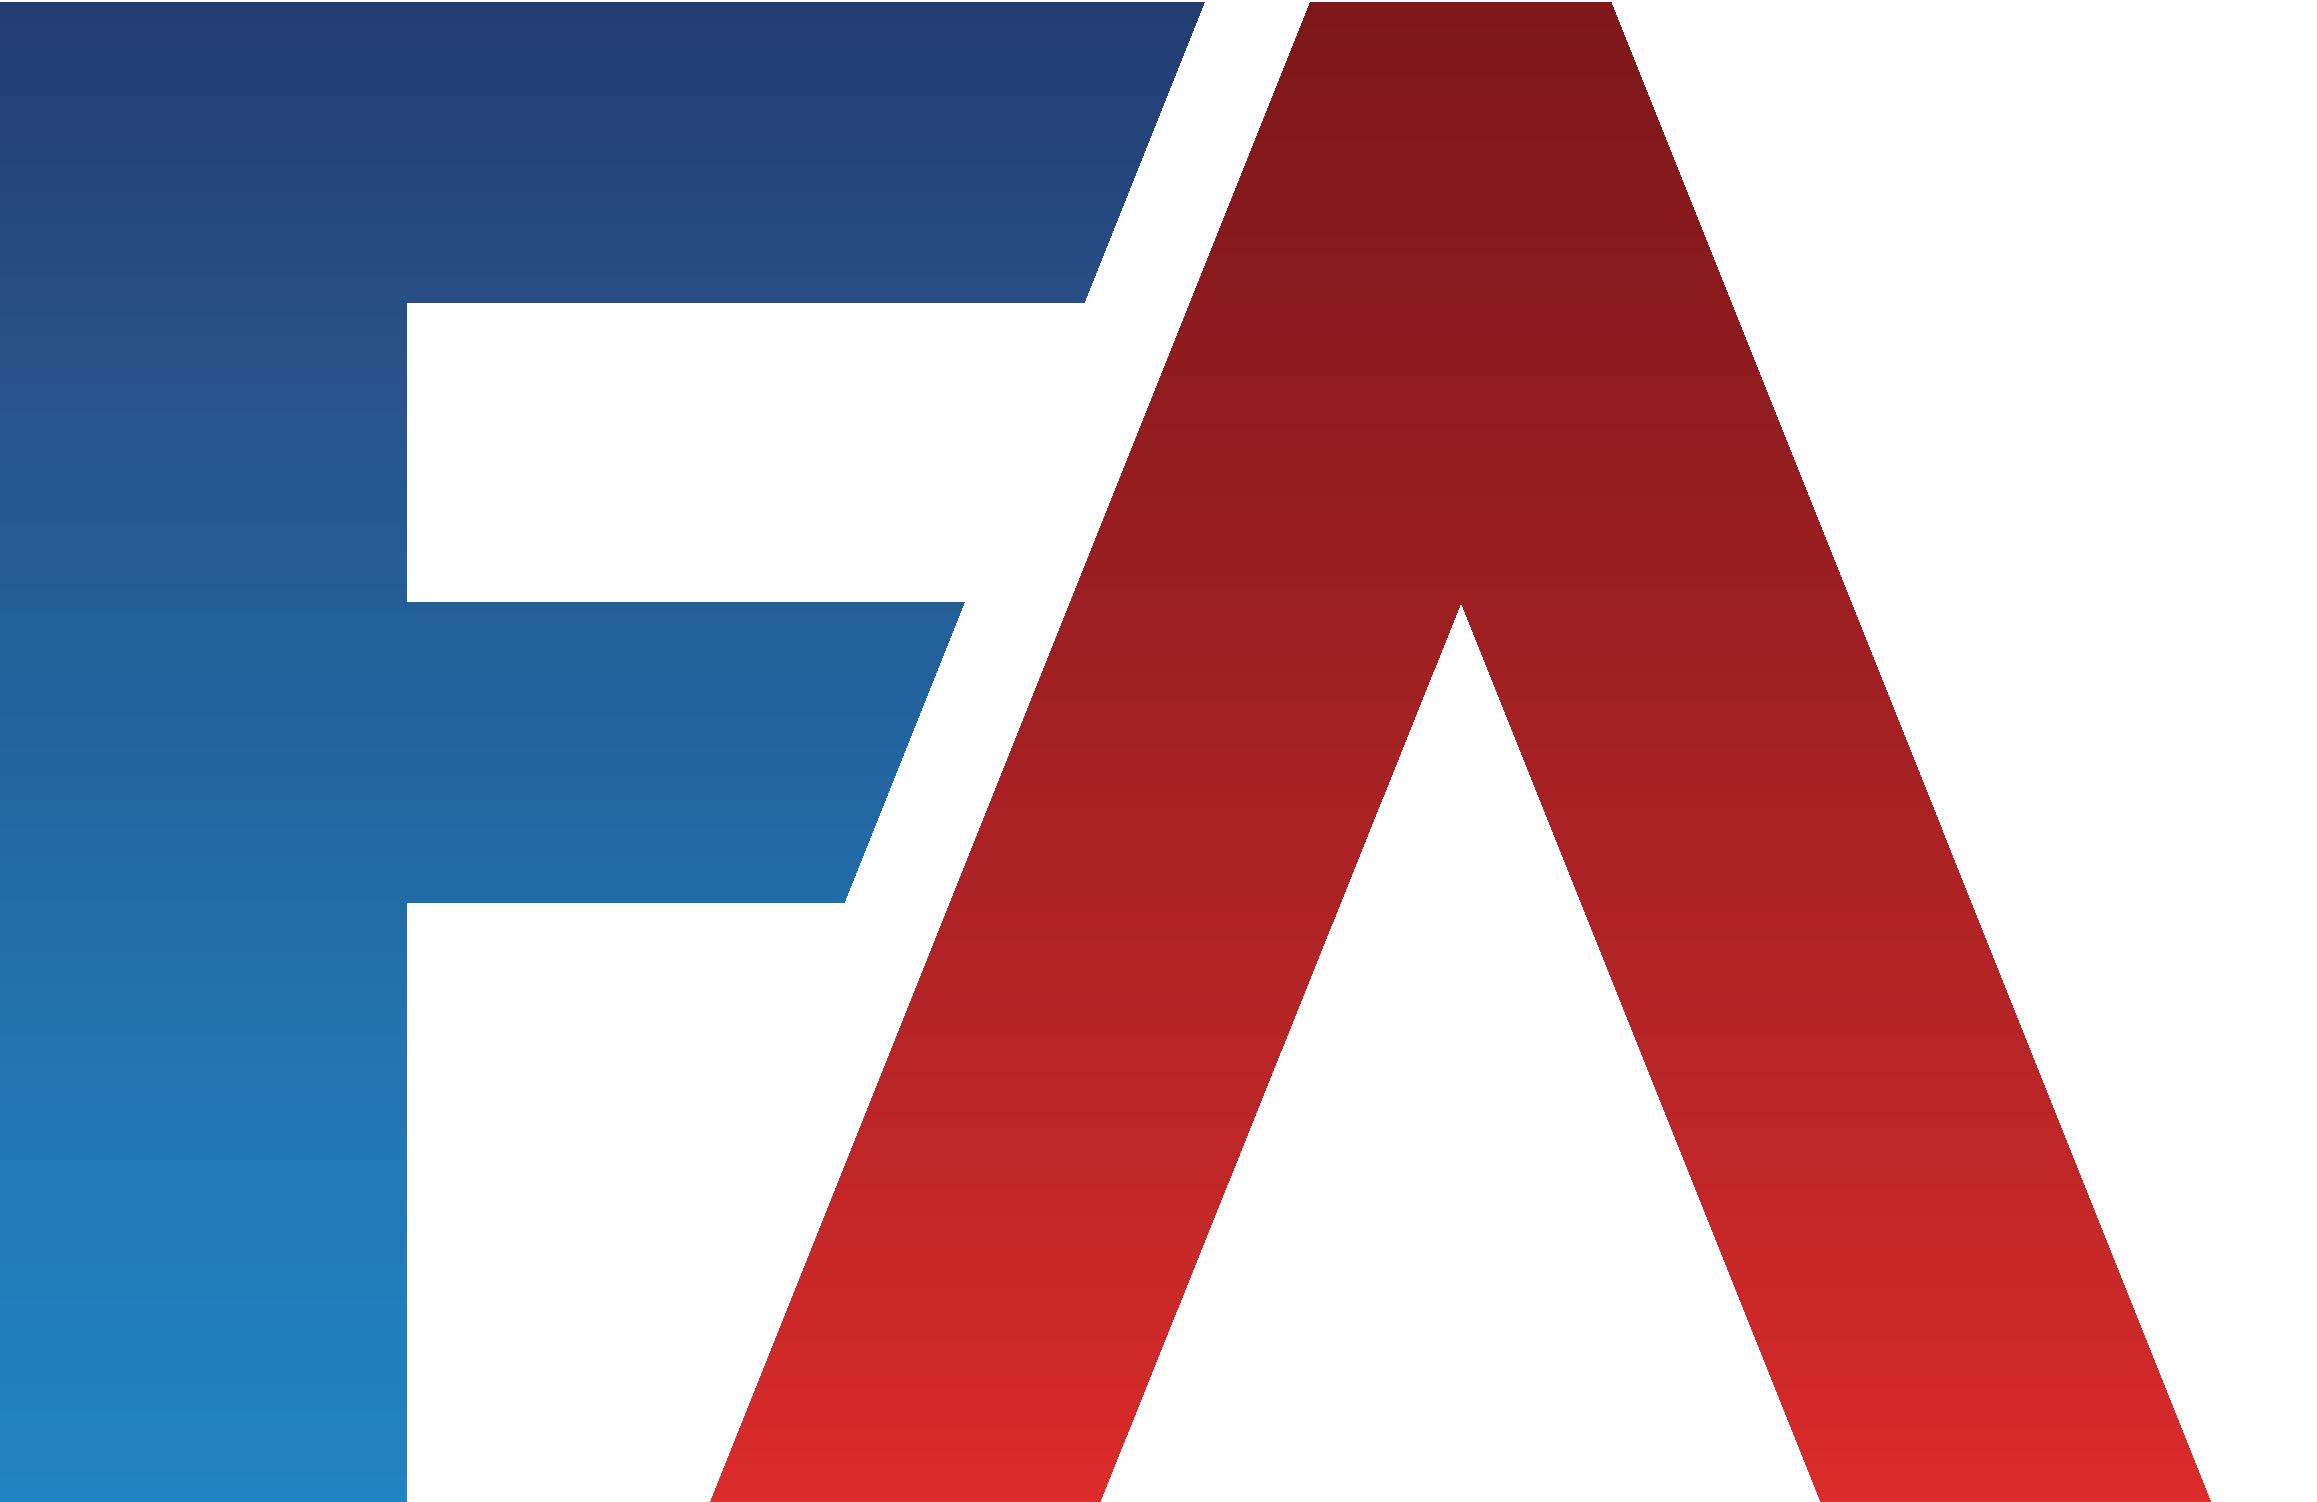 Jimmy Mundine - TE | FantasyAlarm.com